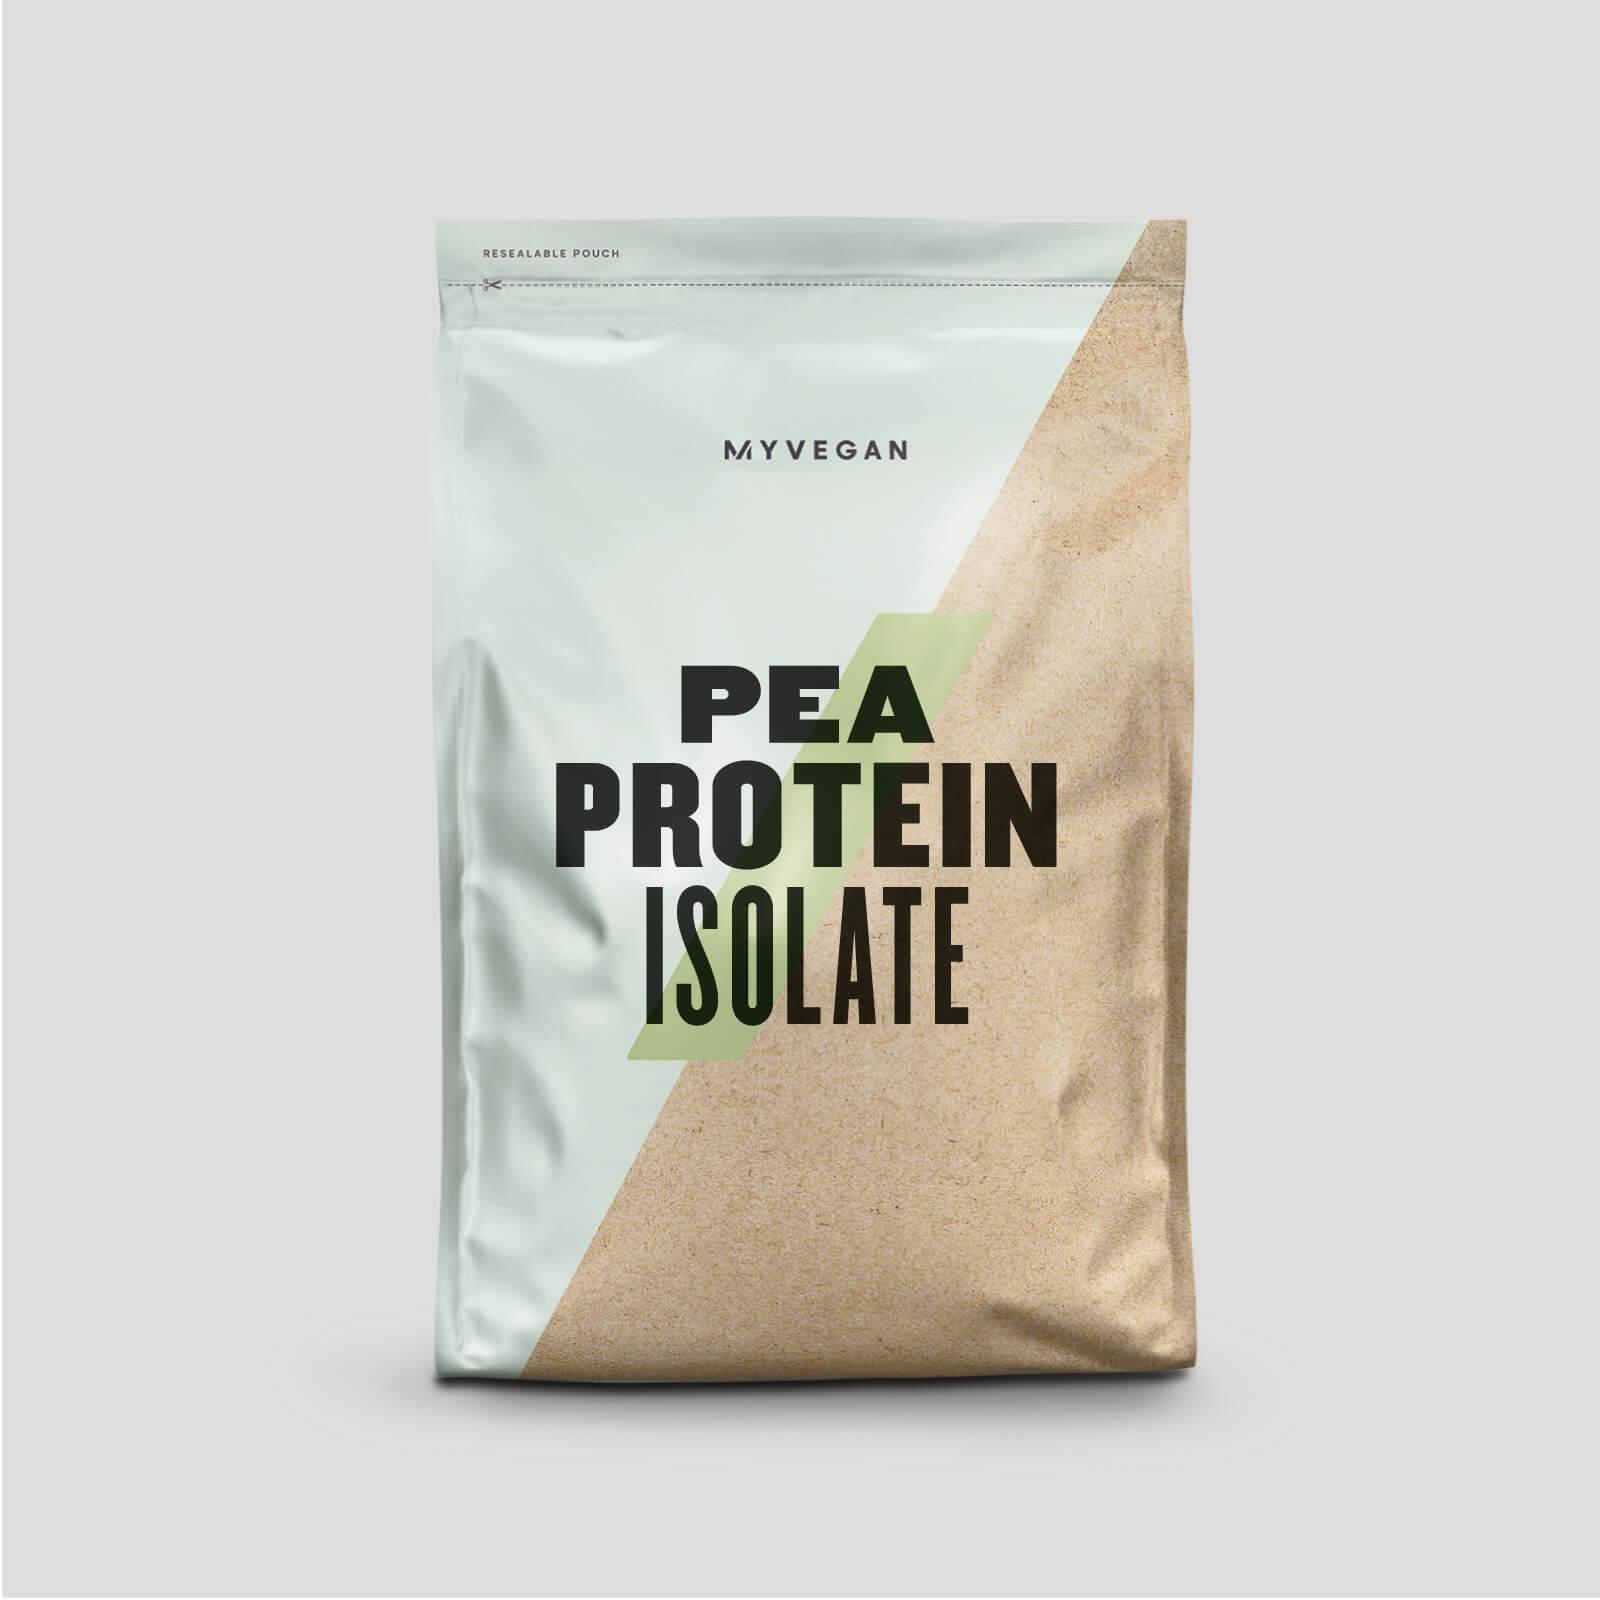 Myprotein Proteine Isolate del Pisello - 1kg - Senza aroma